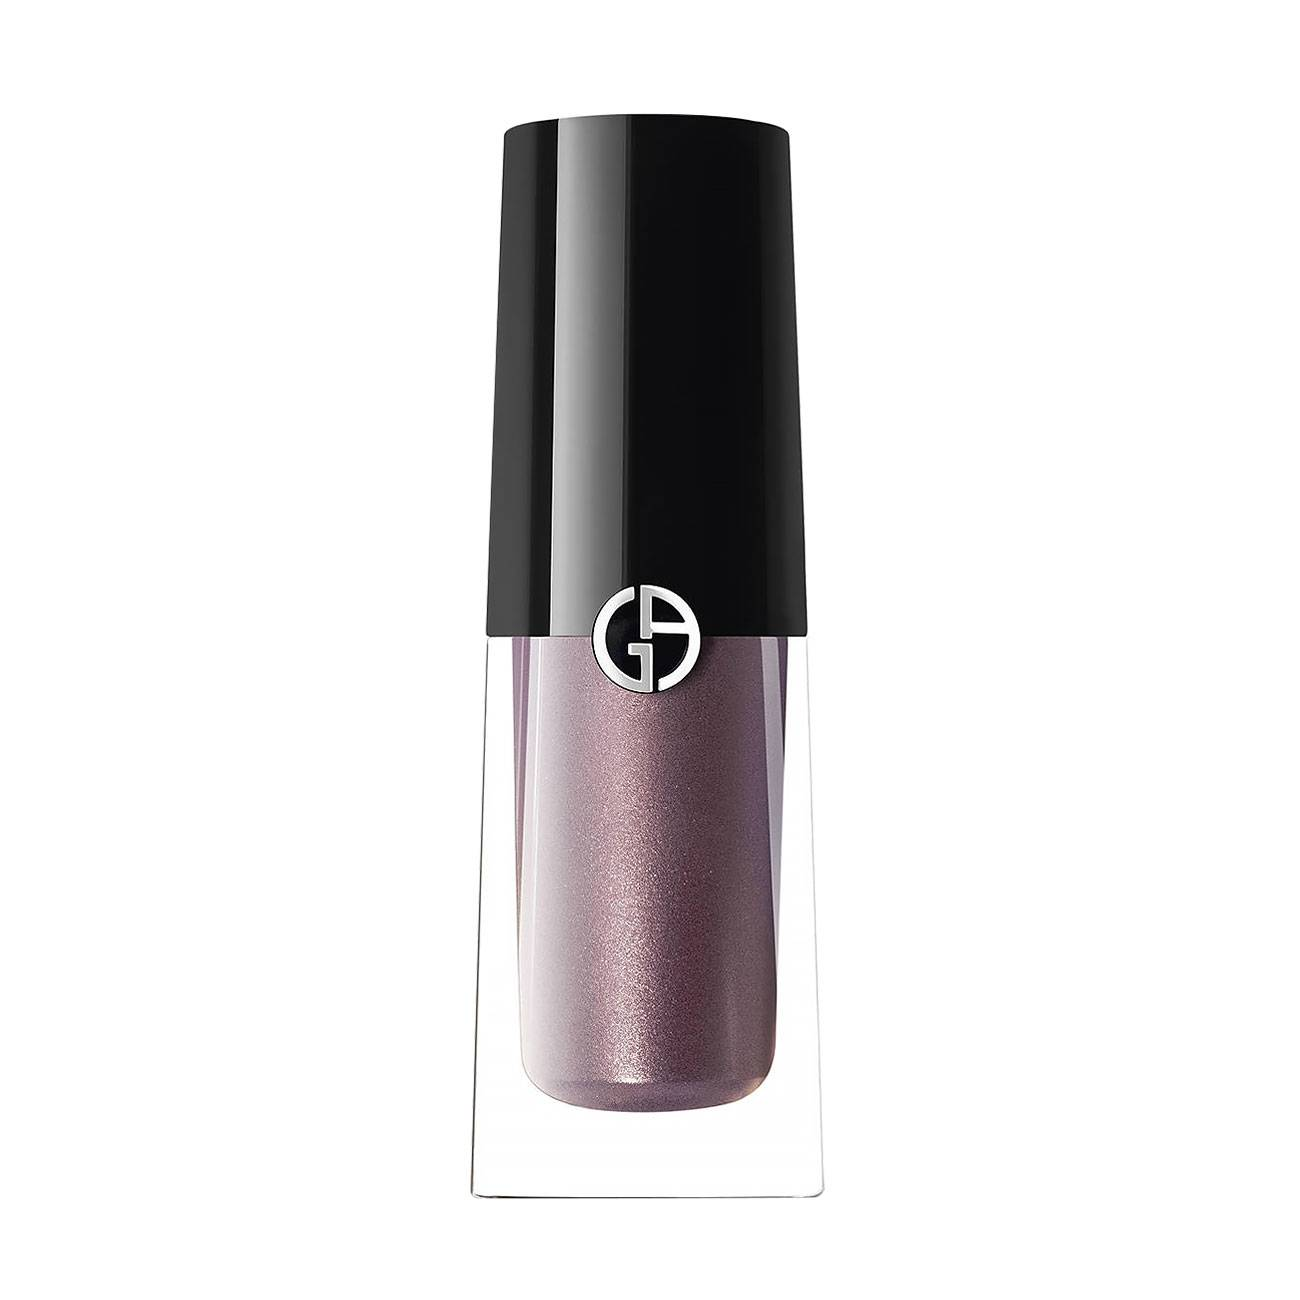 Eye Tint Liquid Eyeshadow 38 4ml Giorgio Armani imagine 2021 bestvalue.eu